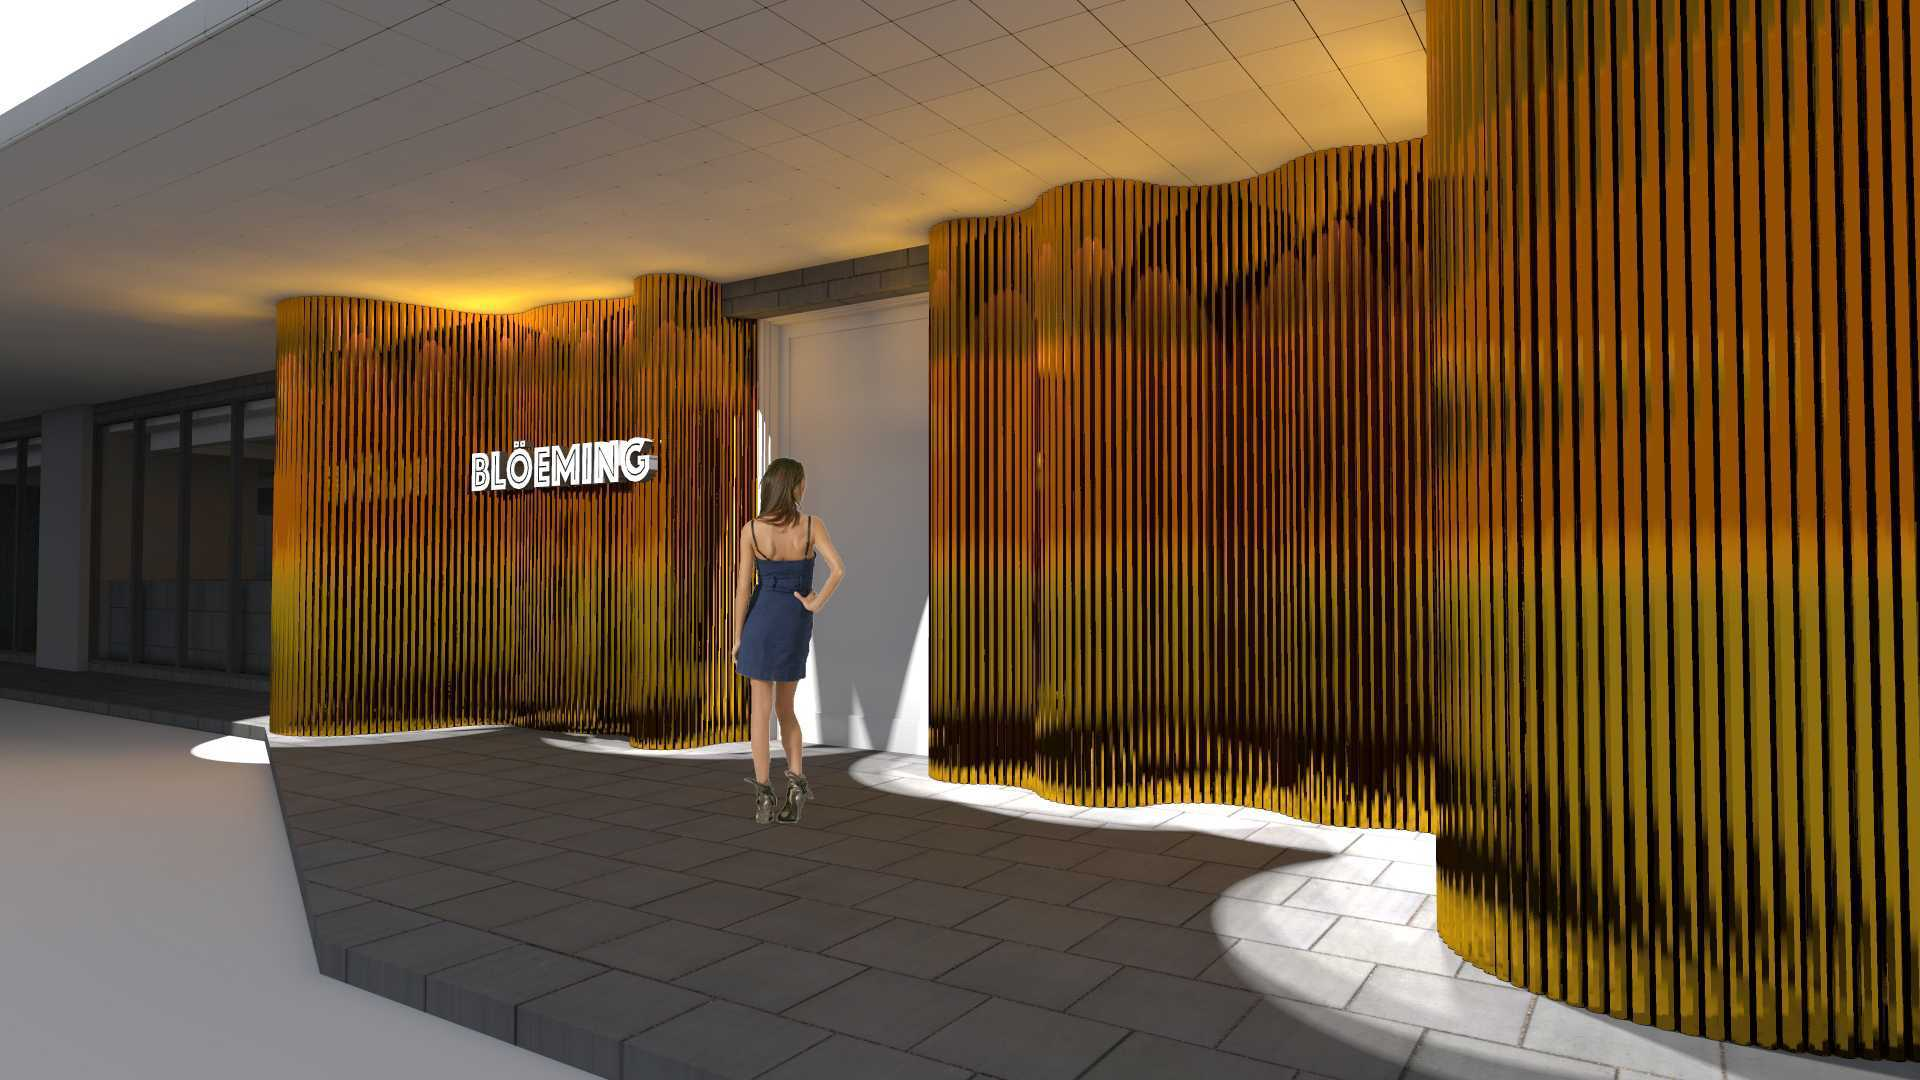 Tau Architect Bloeming Fx Mall Sudirman Jakarta Fx Mall Sudirman Jakarta Entrance-Night   16731